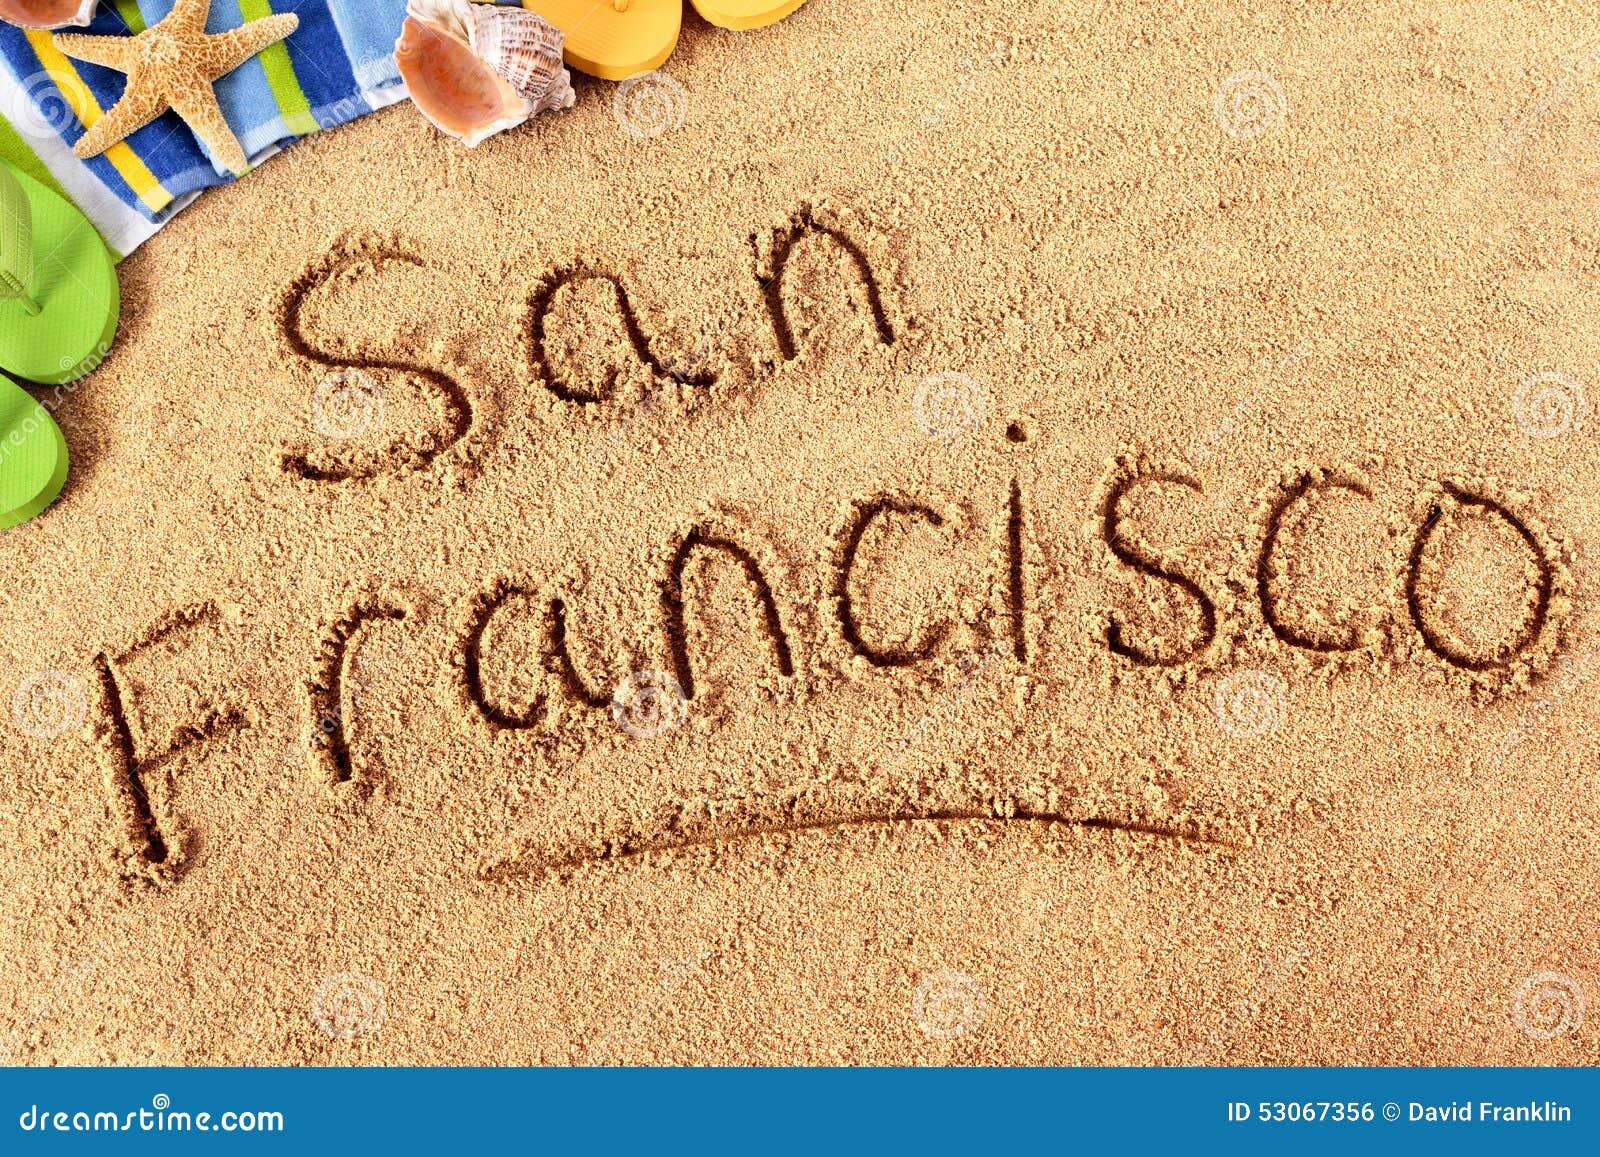 ... San Jose Ca cheapwriteessaybuy tech Business San Francisco Business